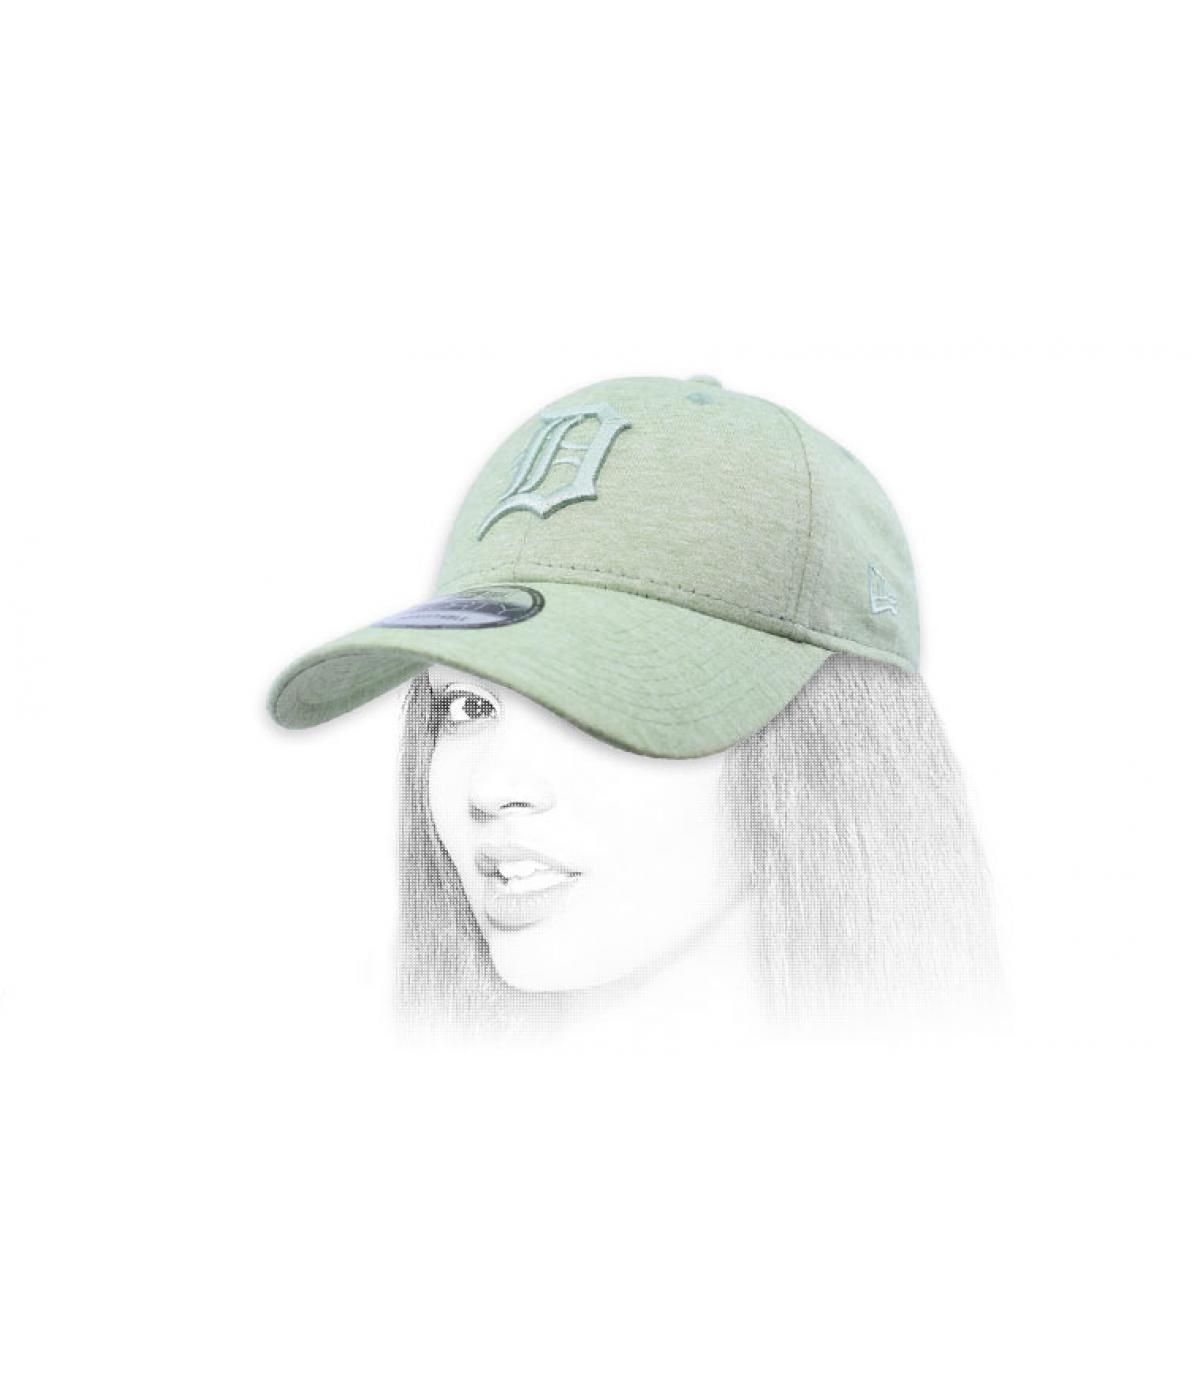 Cap D hellgrün